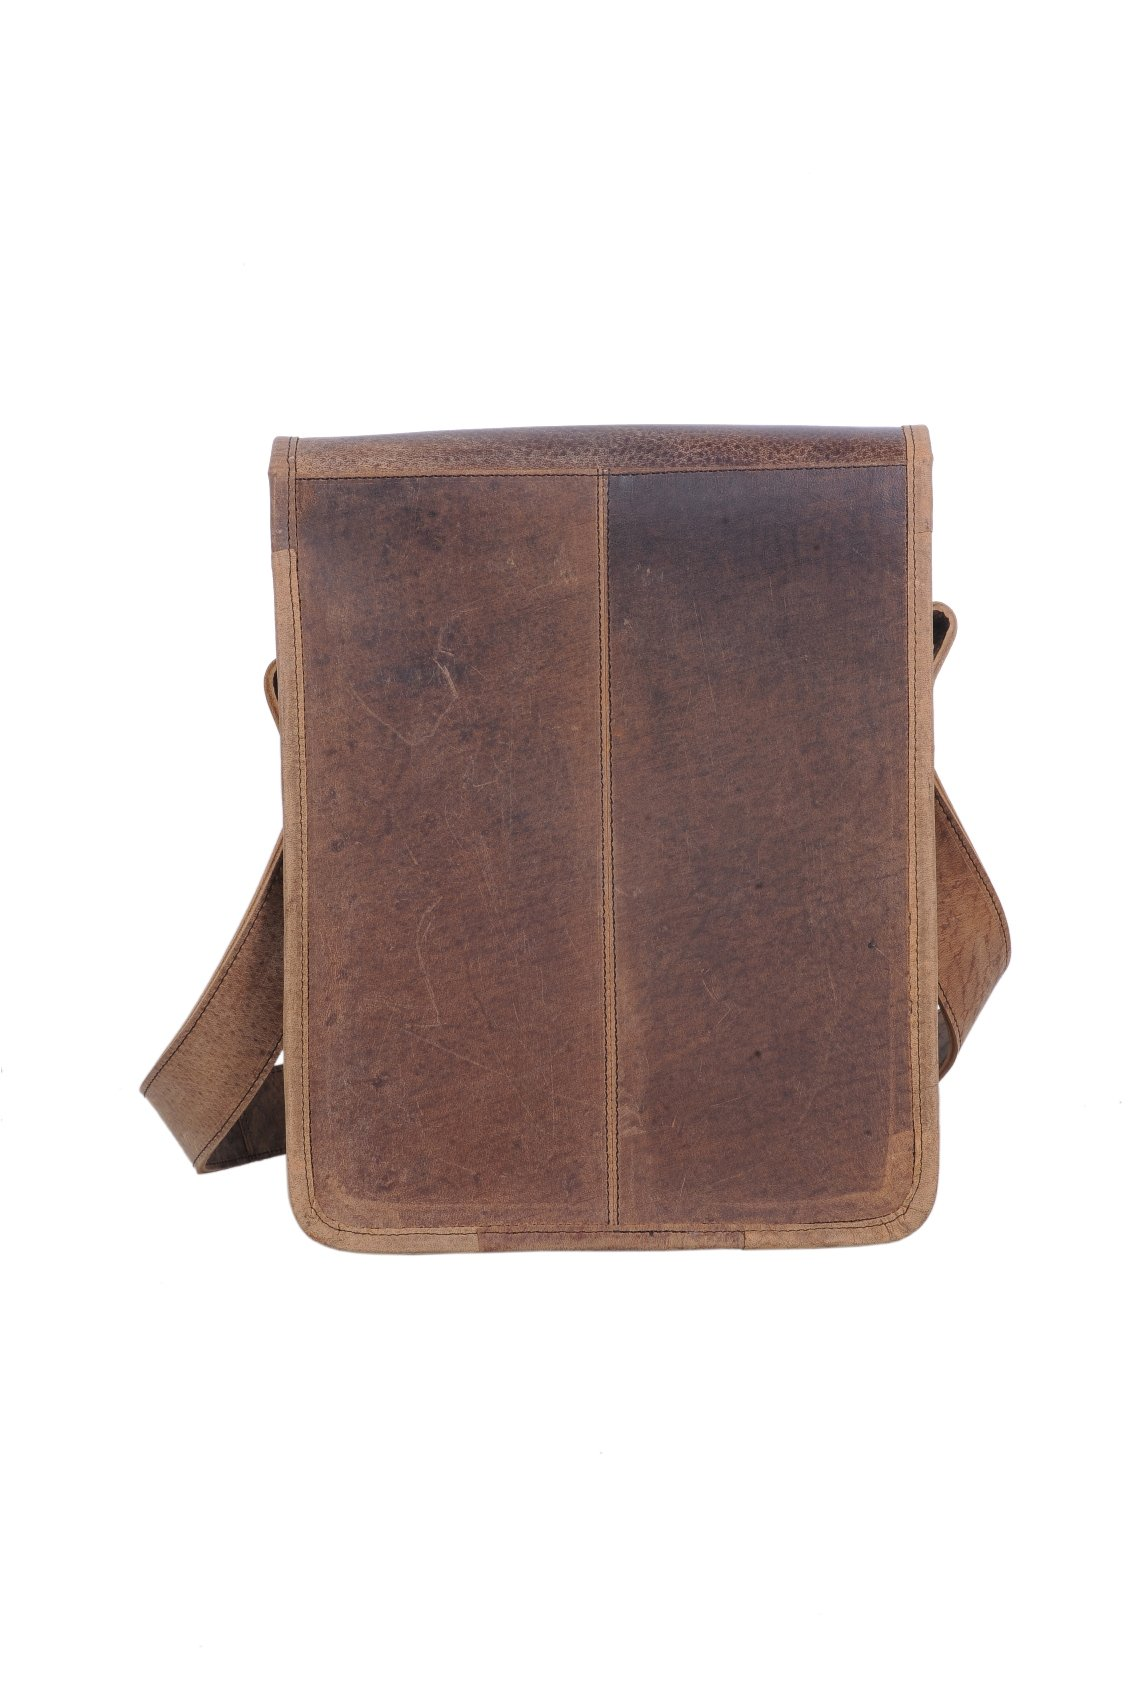 Komalc 11 Inch Vintage Hunter Leather Satchel for Ipad / TabletsSALE by KomalC (Image #5)